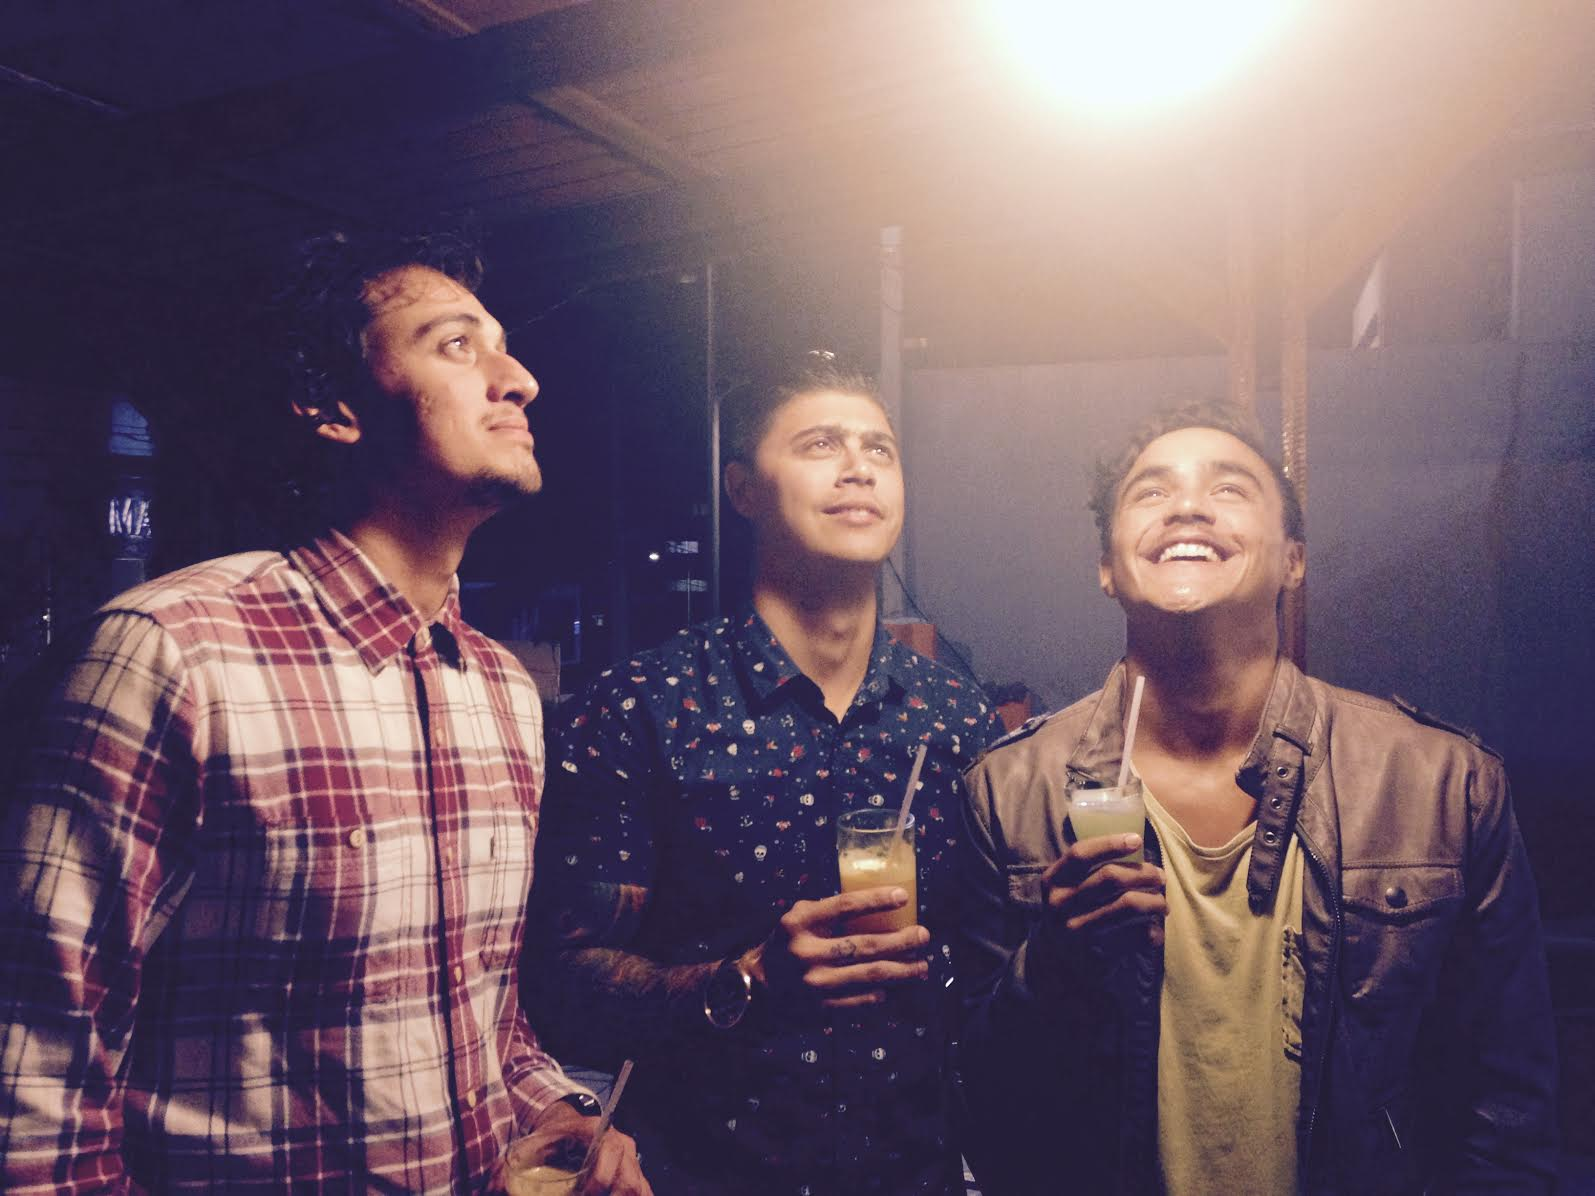 Bros, Juice, Light, and Love #amor. Photo:  @viickmartins